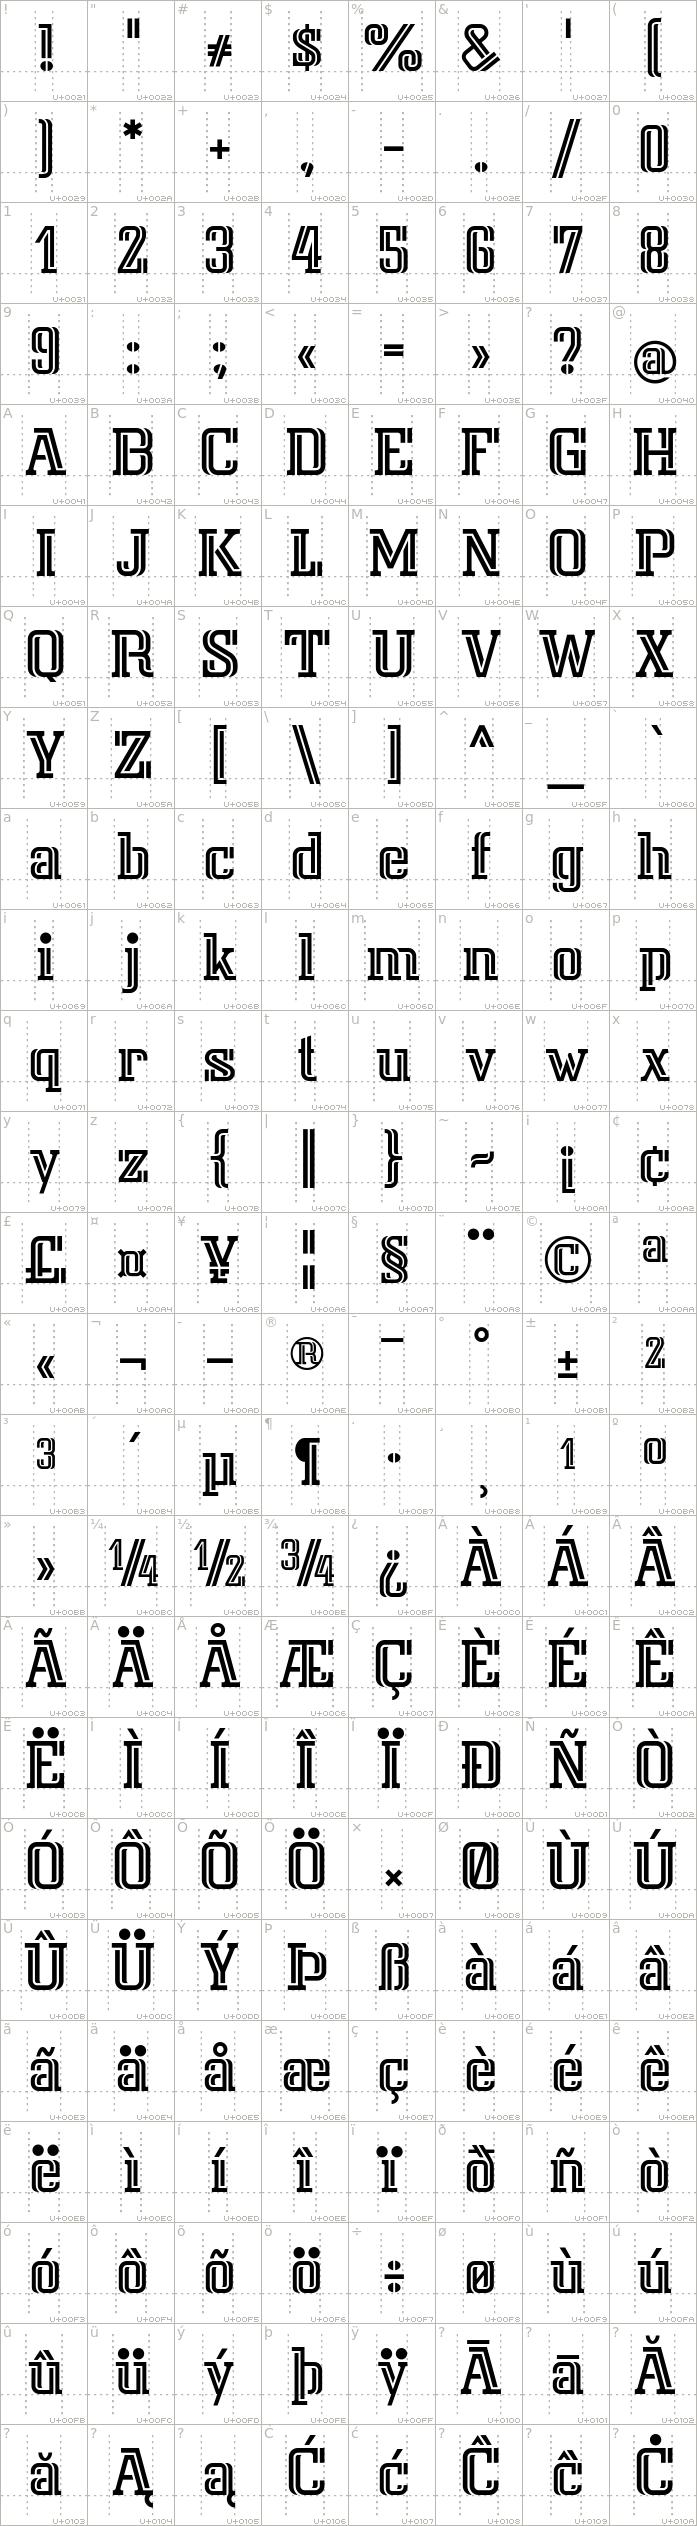 isar-cat.regular.character-map-1